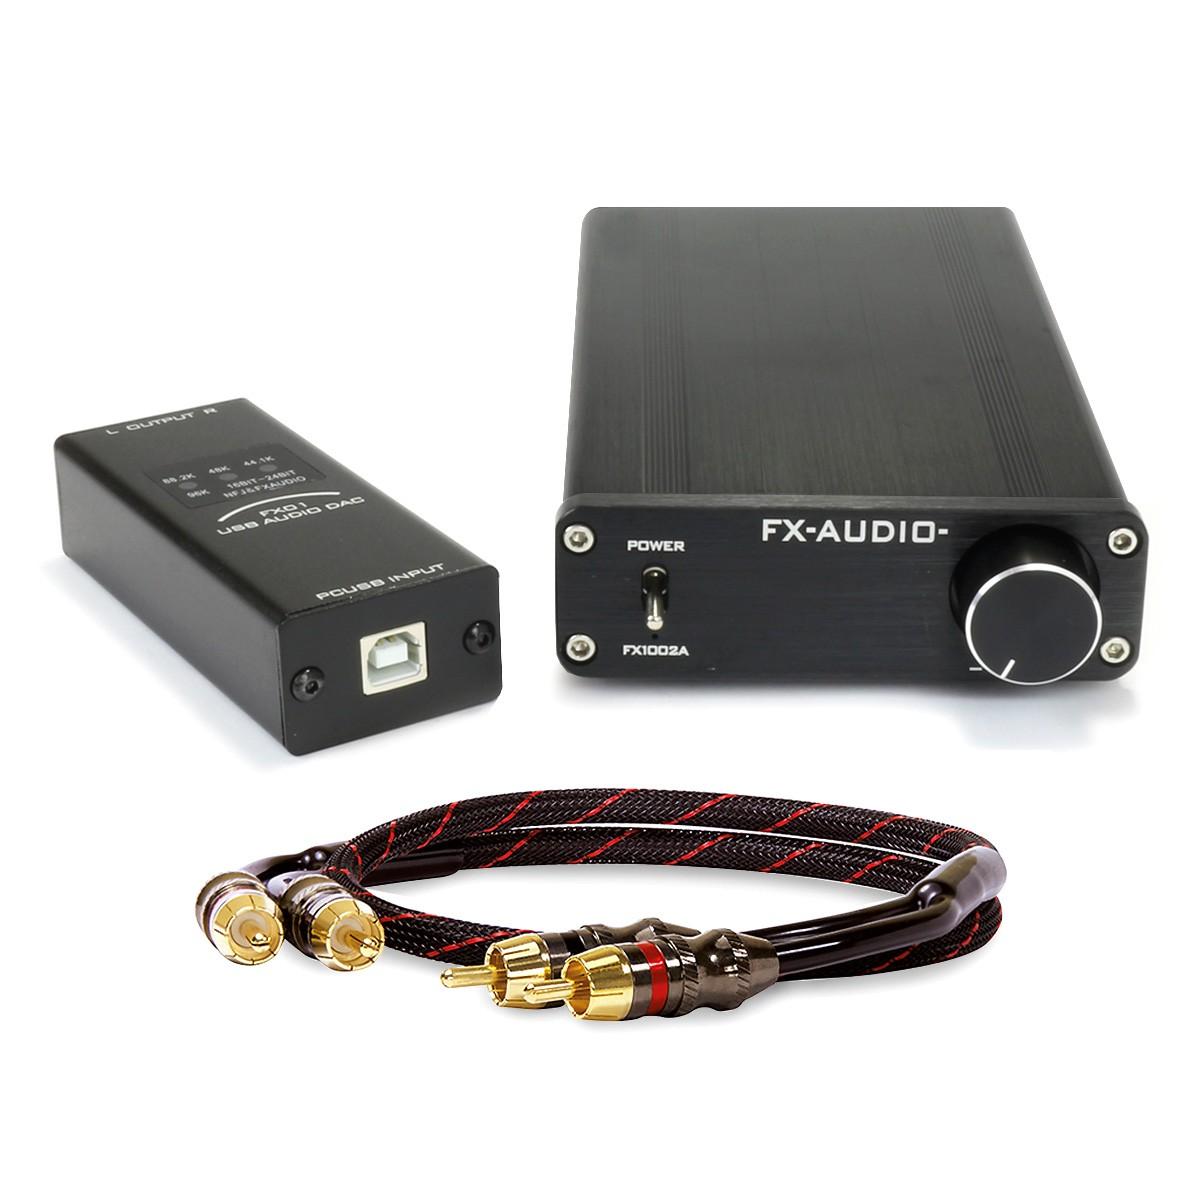 Pack FX-AUDIO FX1002A 2x125W Amplifier 4 Ohm + FX-AUDIO FX01 USB DAC + DYNAVOX RCA Cable